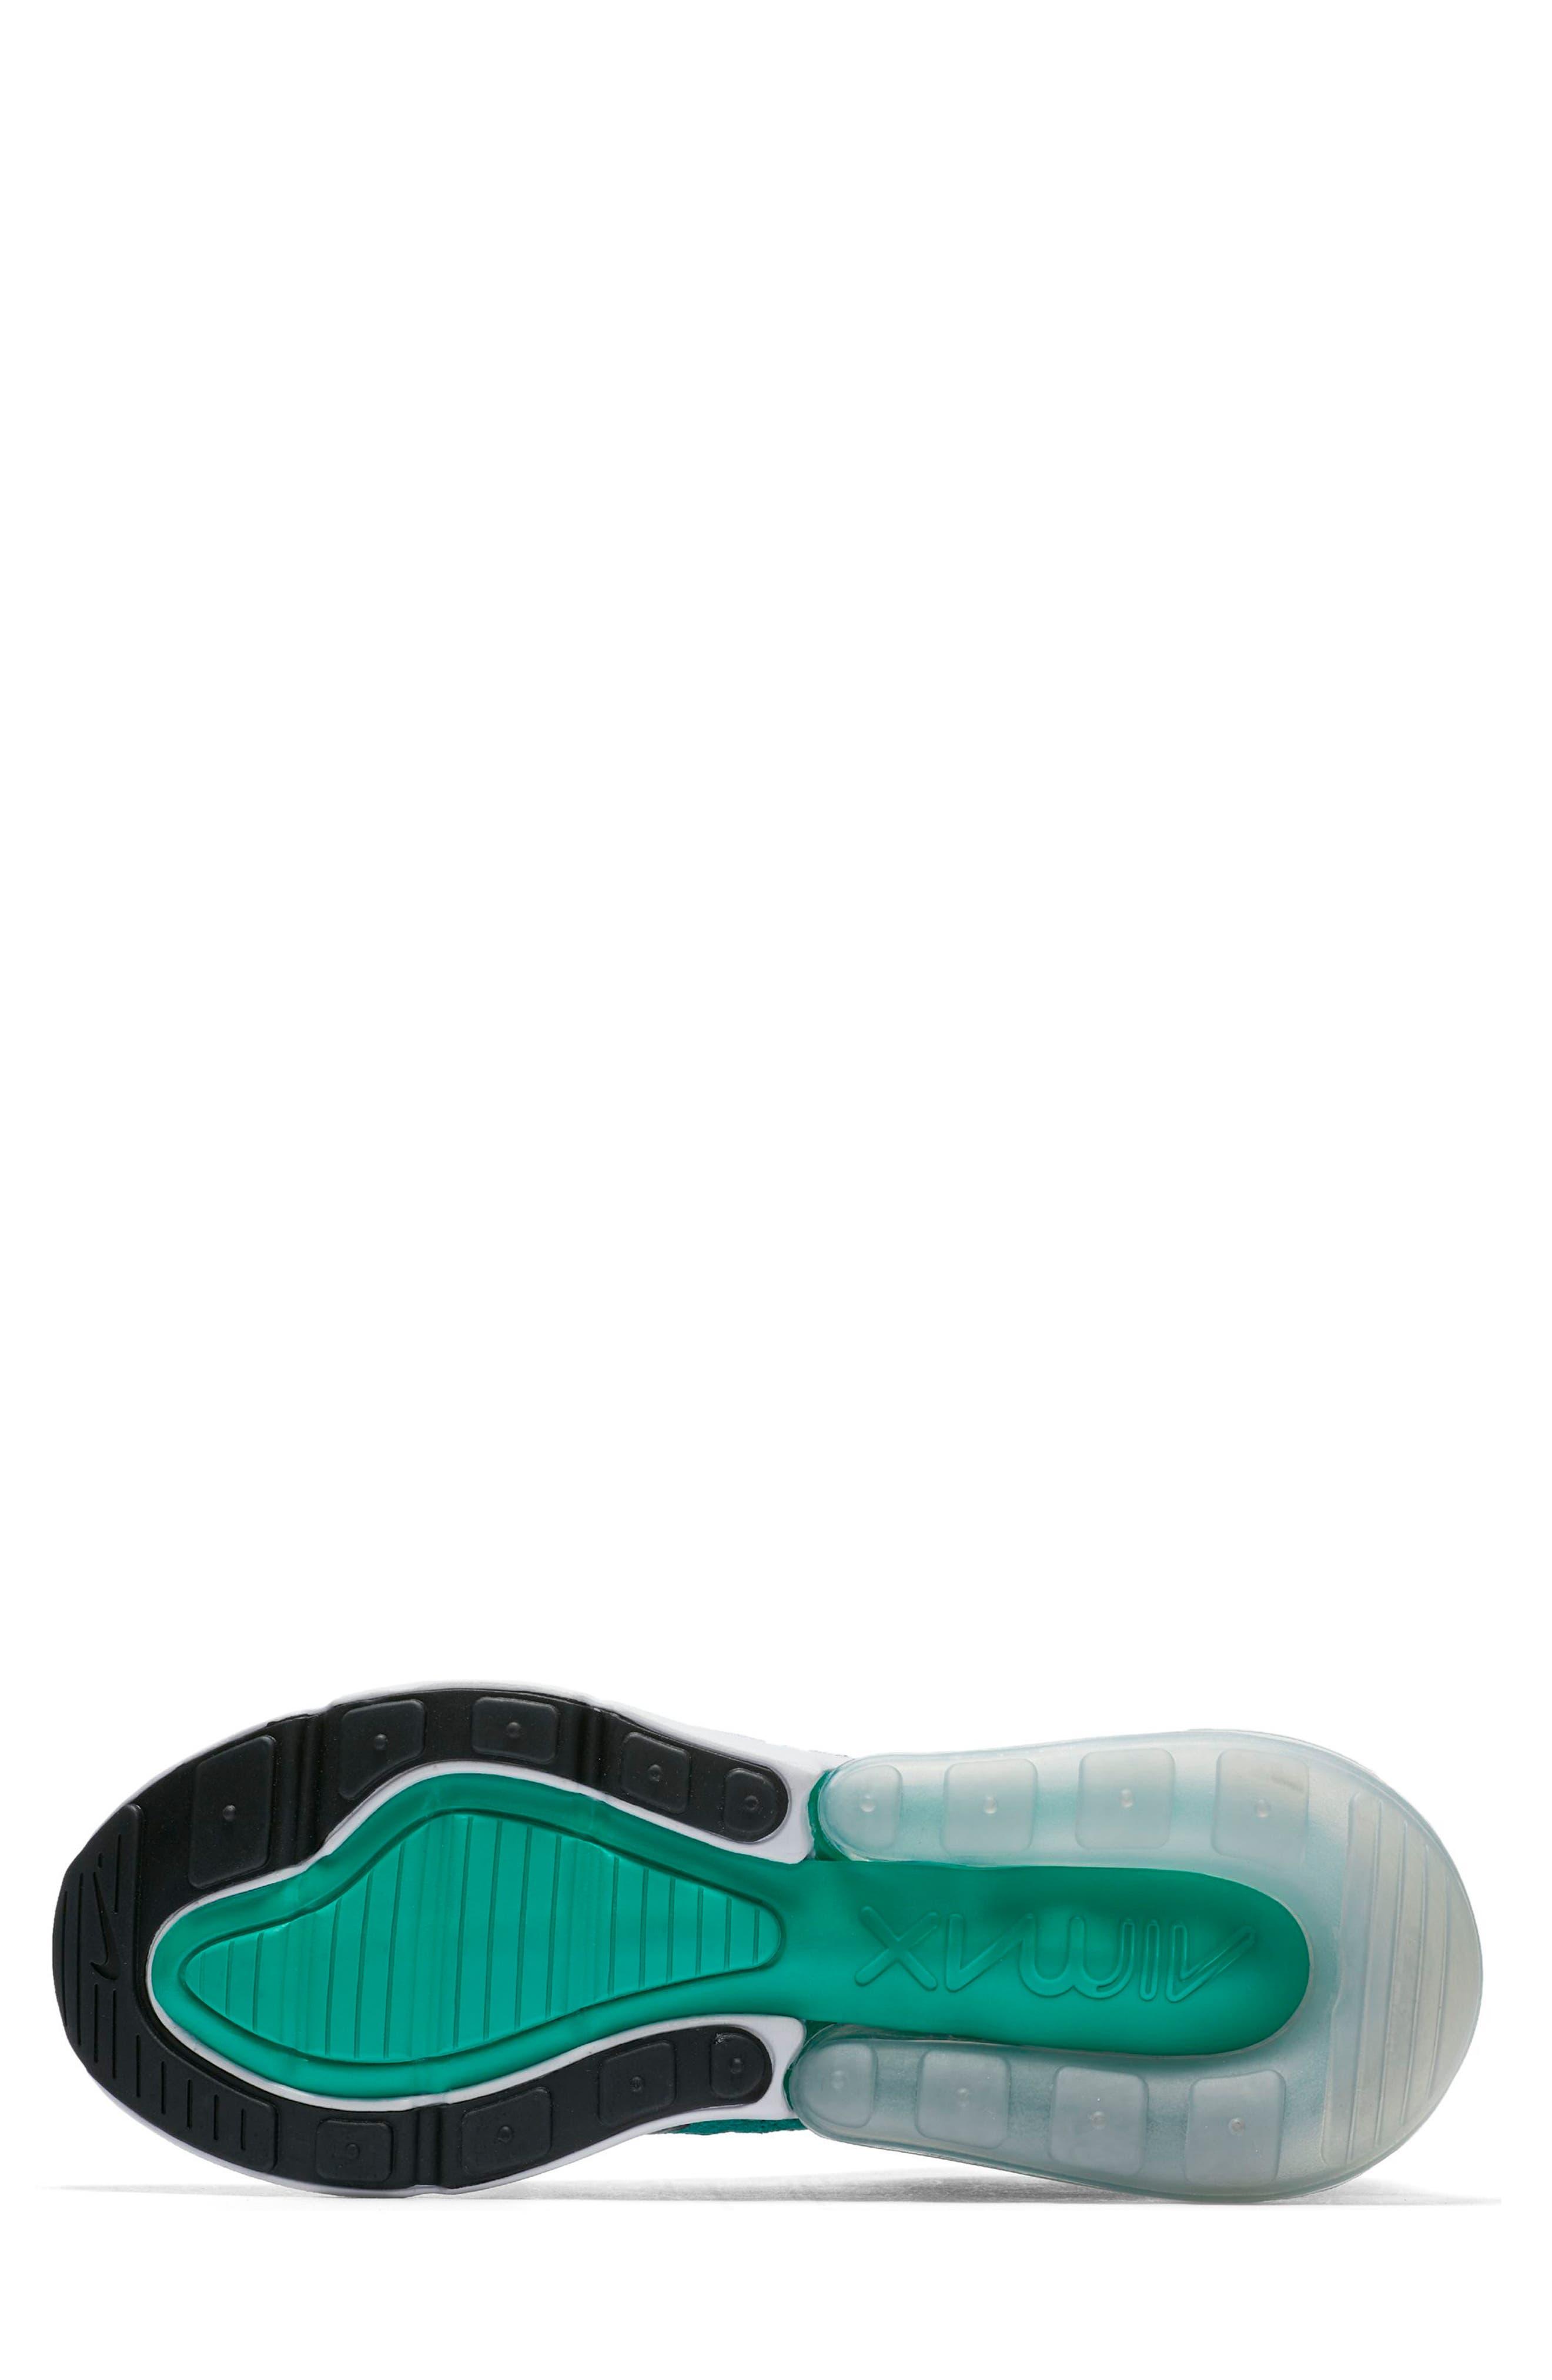 Air Max 270 Flyknit Sneaker,                             Alternate thumbnail 5, color,                             EMERALD/ BLACK/ PURE PLATINUM